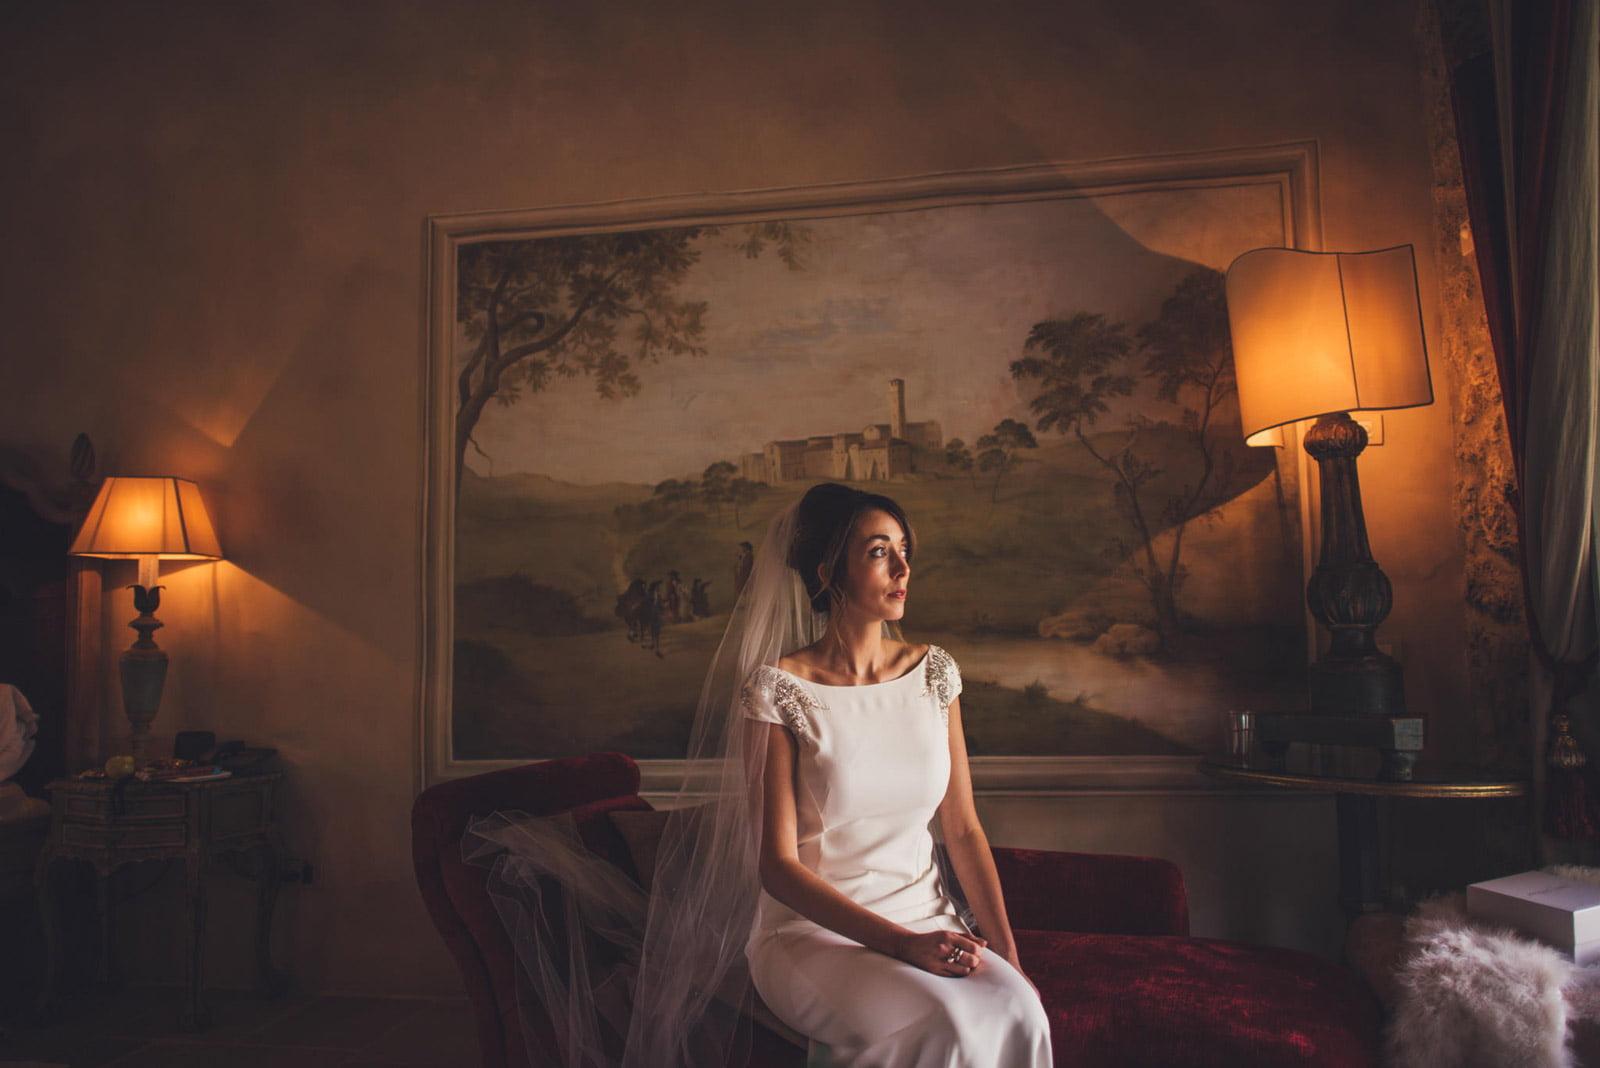 035-wedding-tuscany-san-galgano-federico-pannacci-photographer